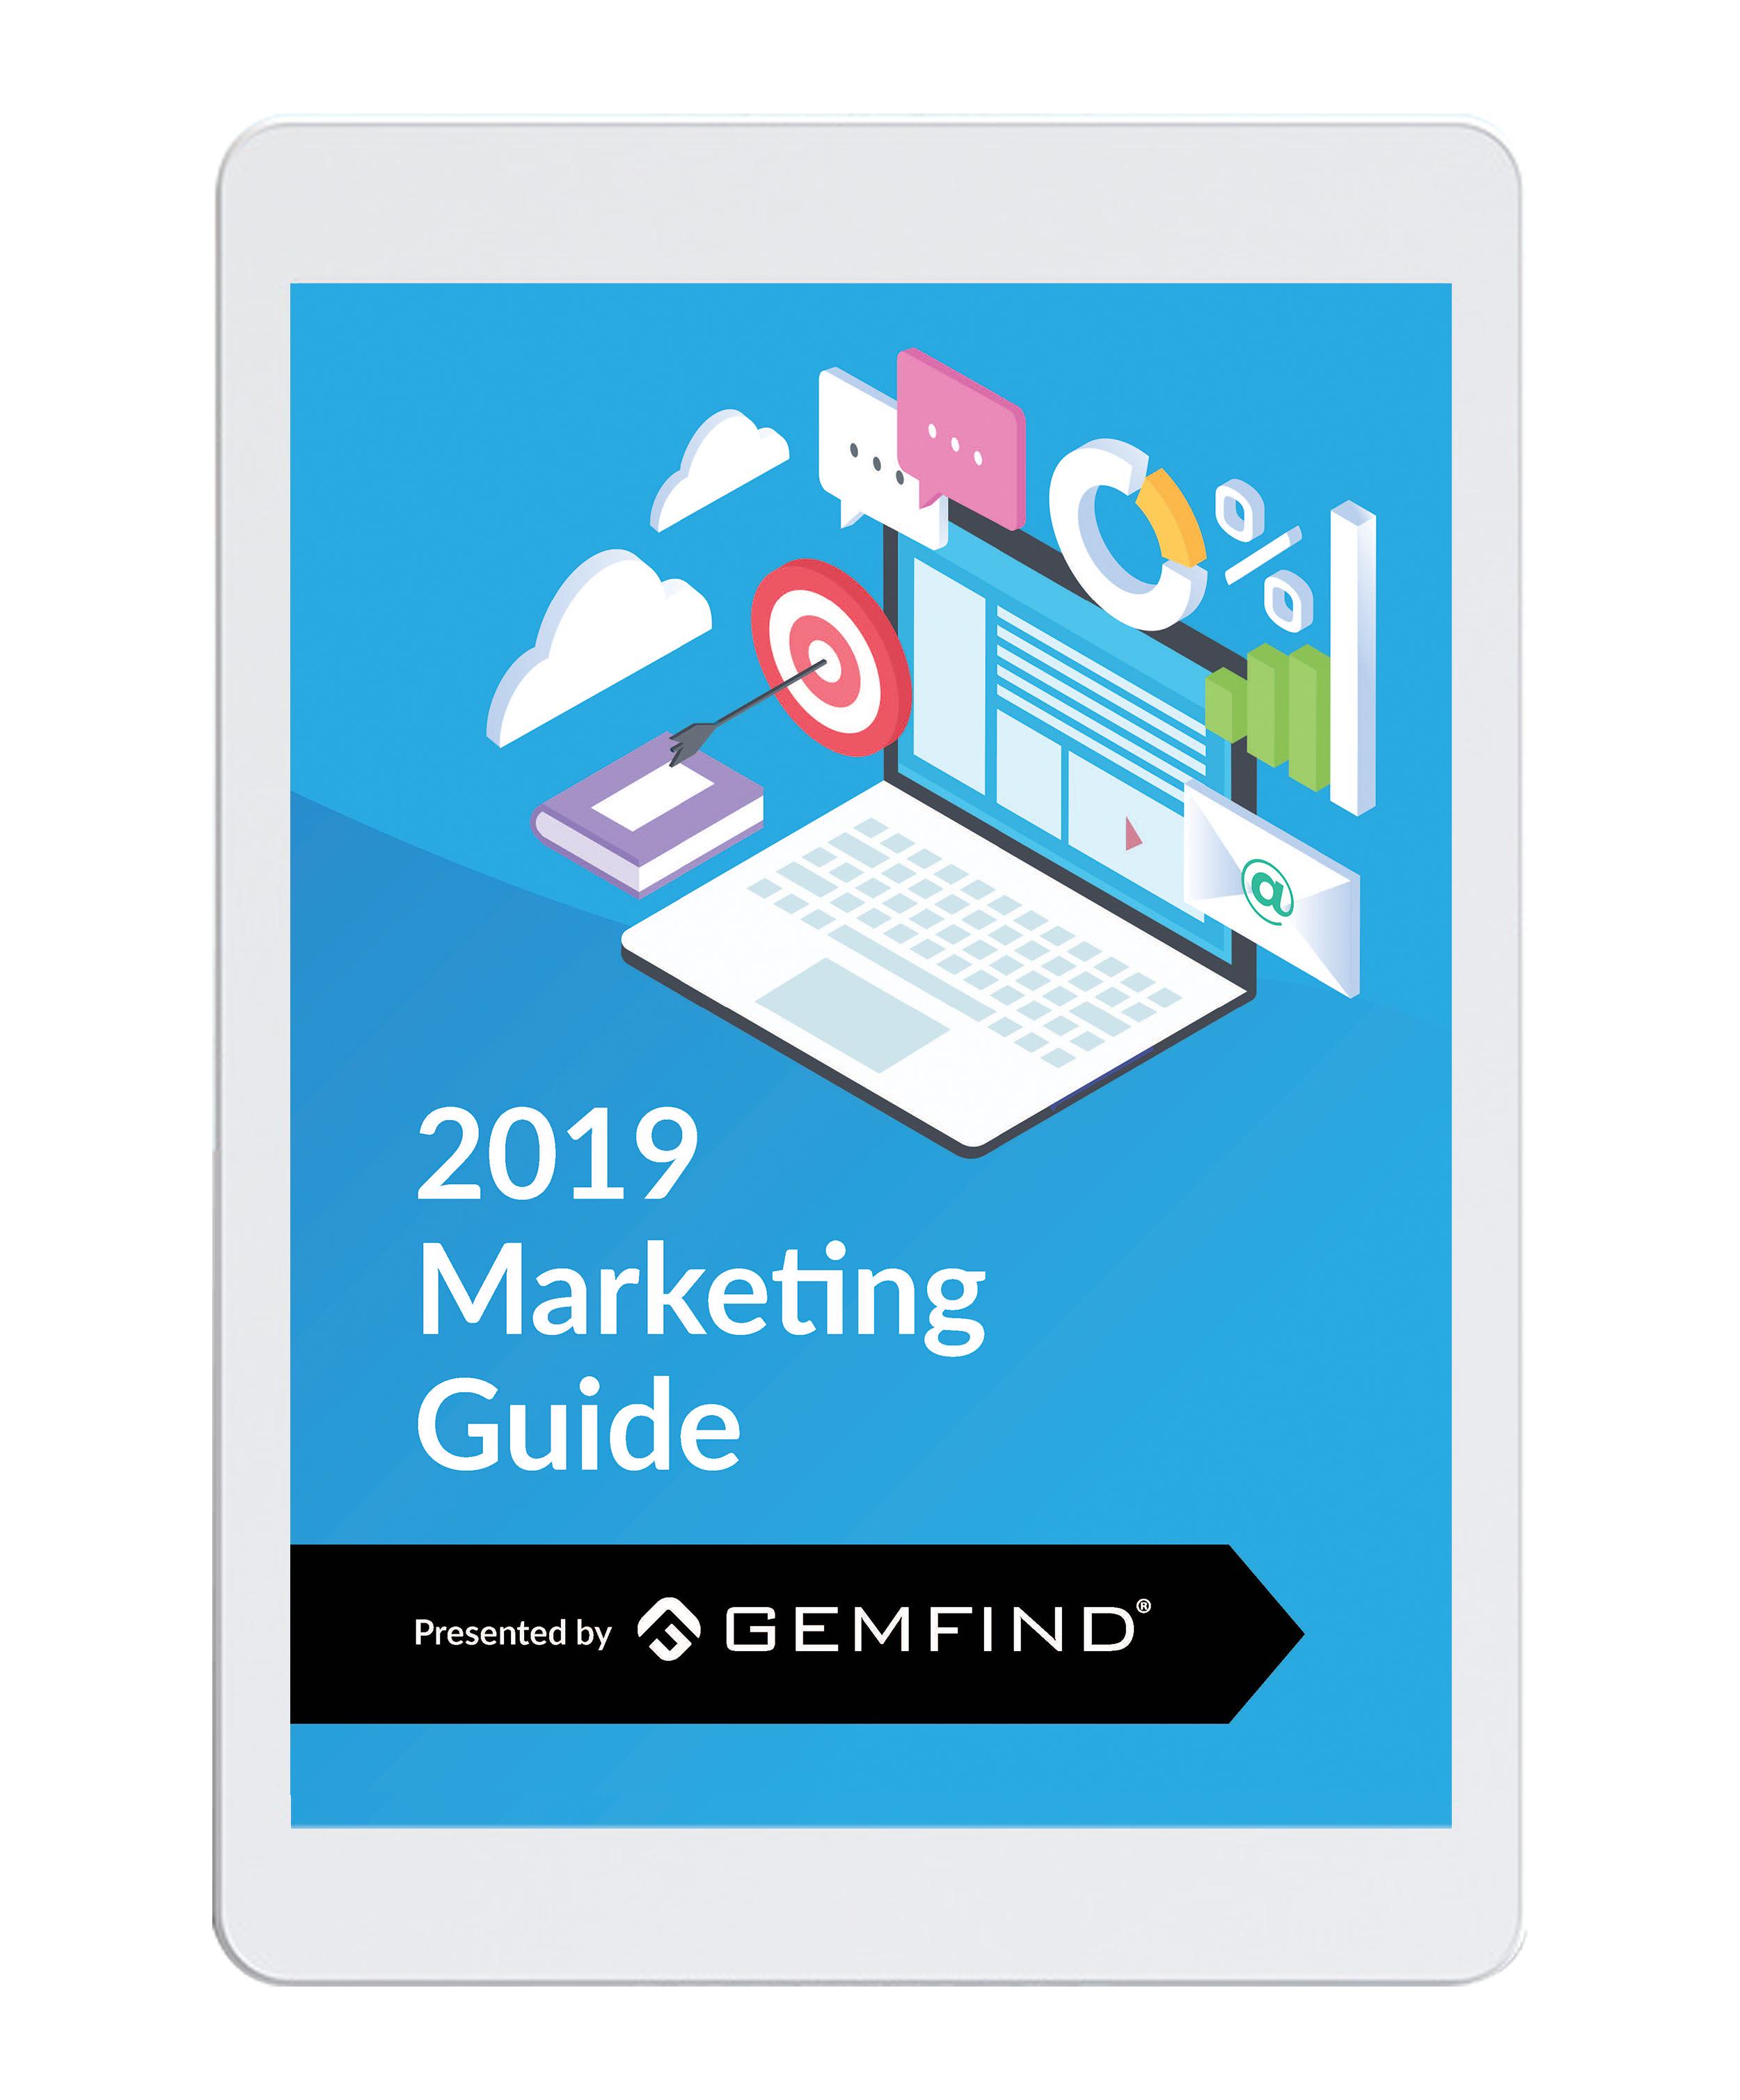 GF markt guide 2019